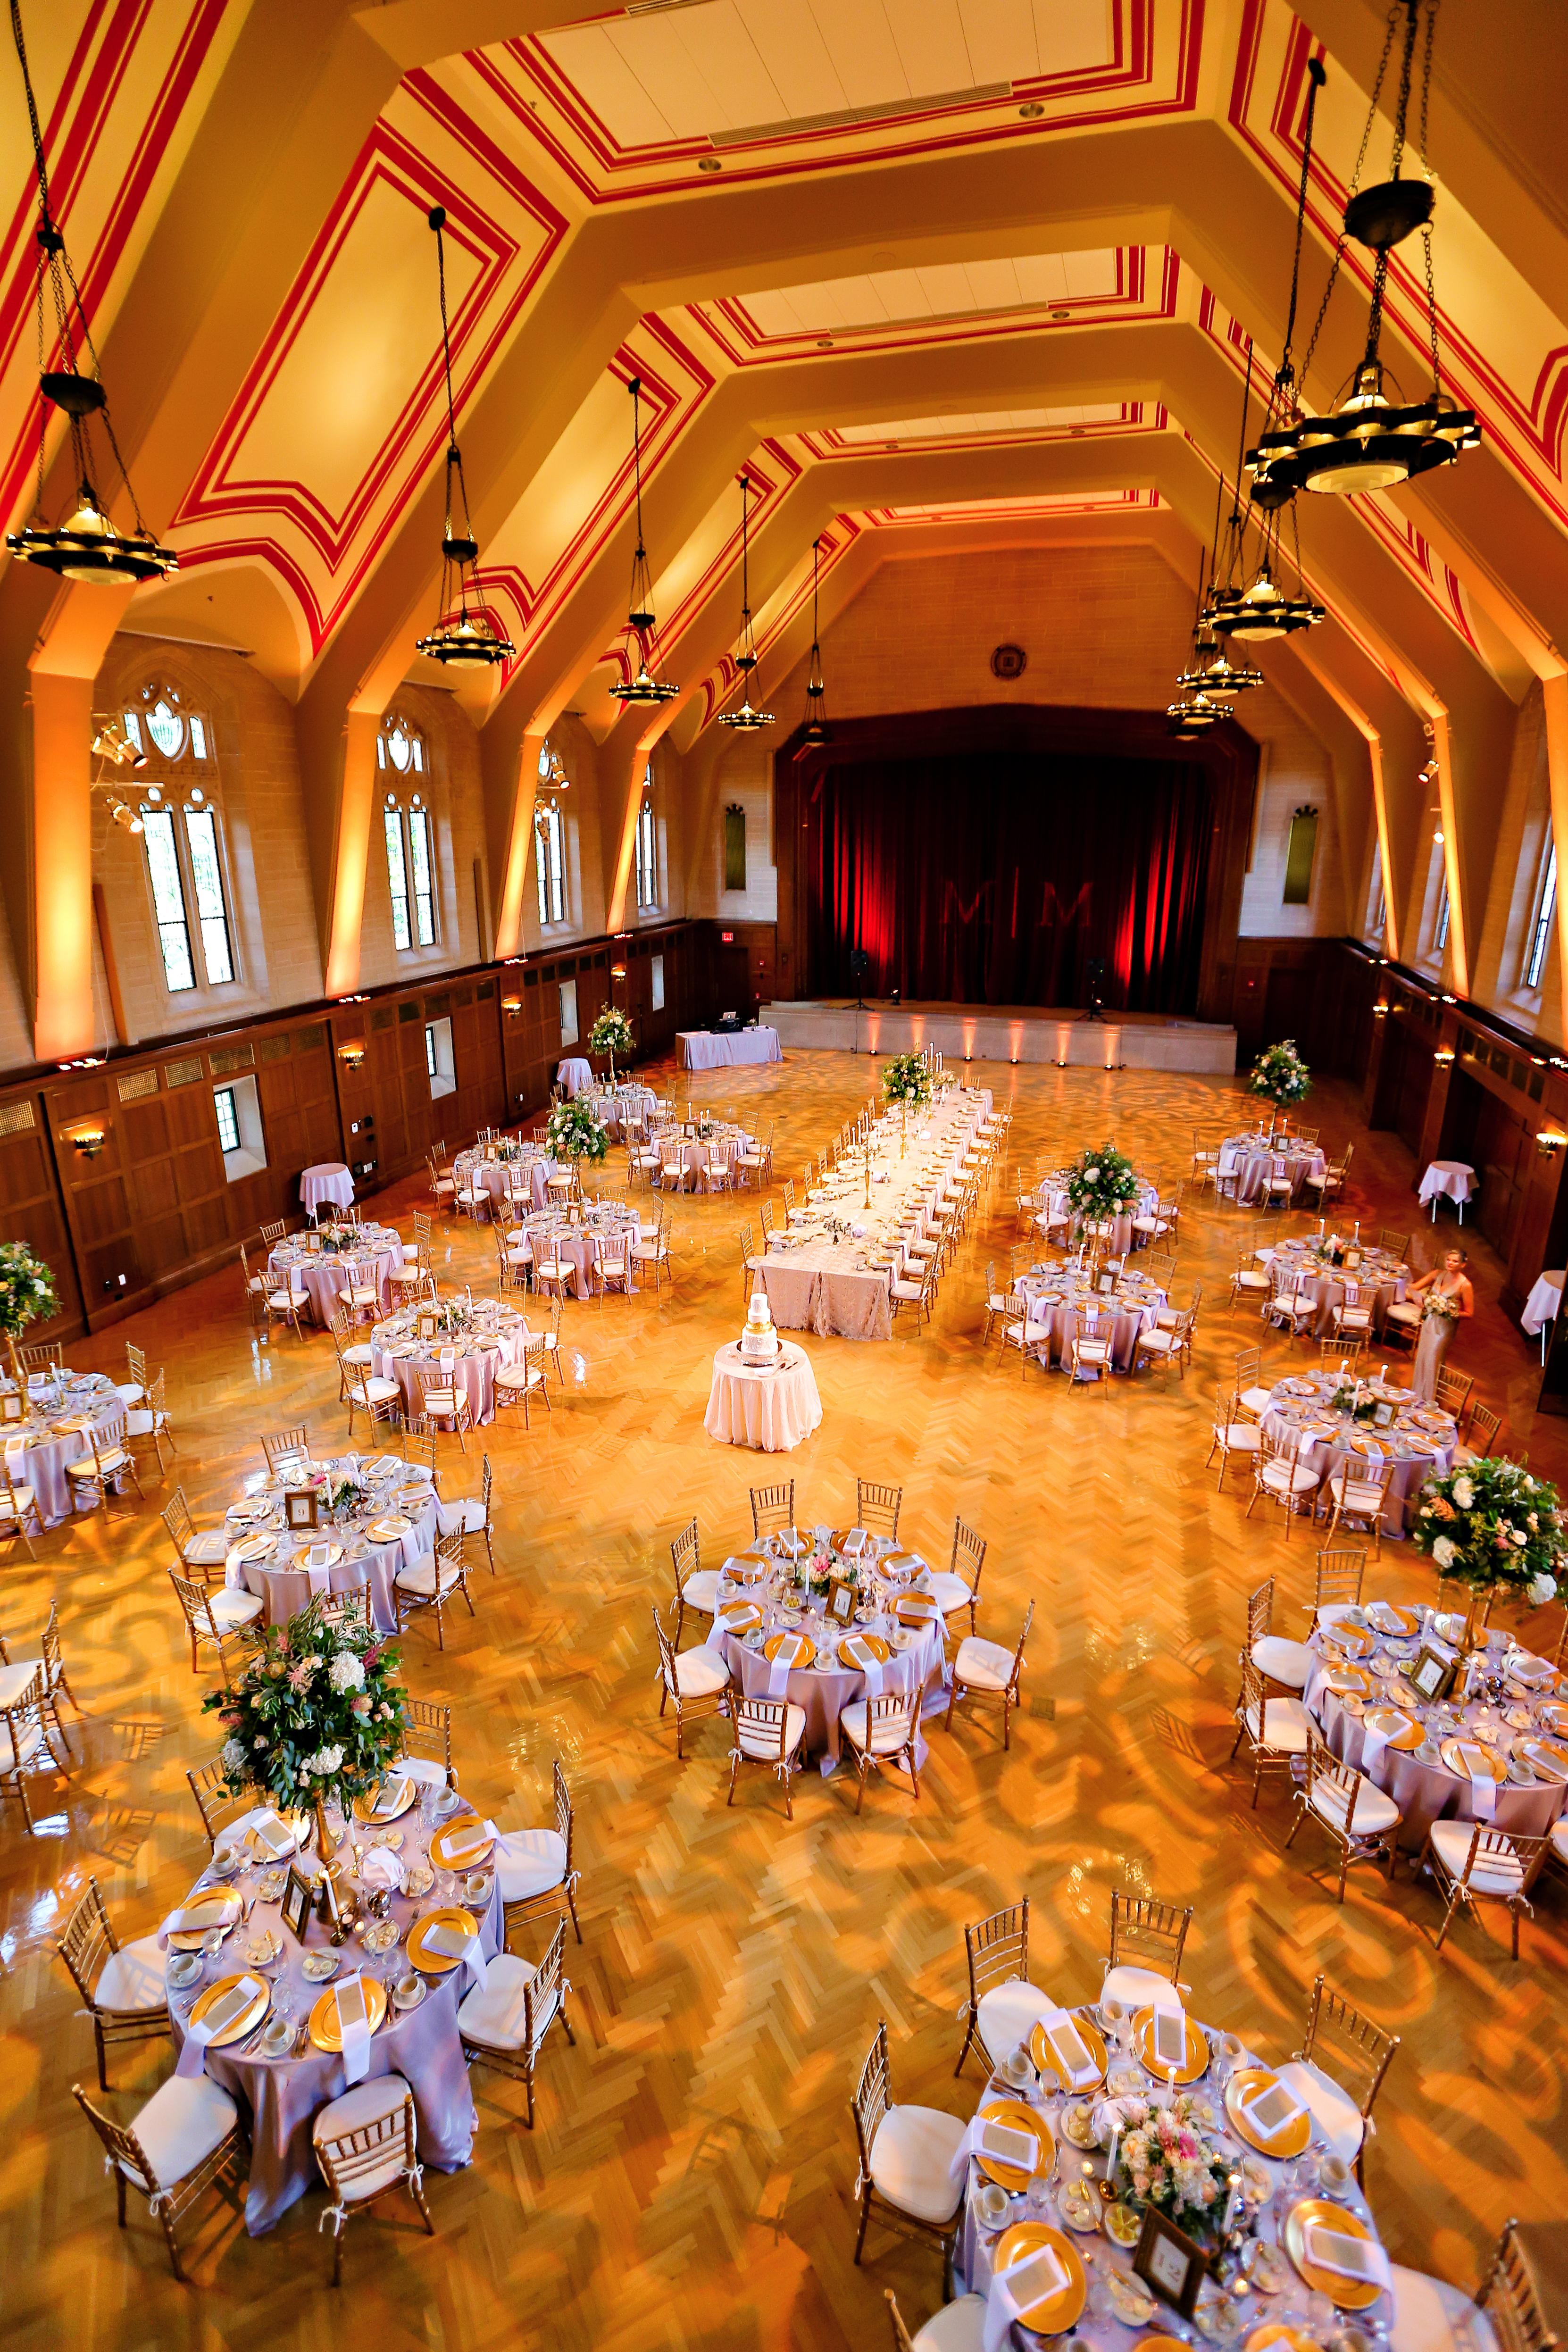 260 meaghan matt indiana university wedding